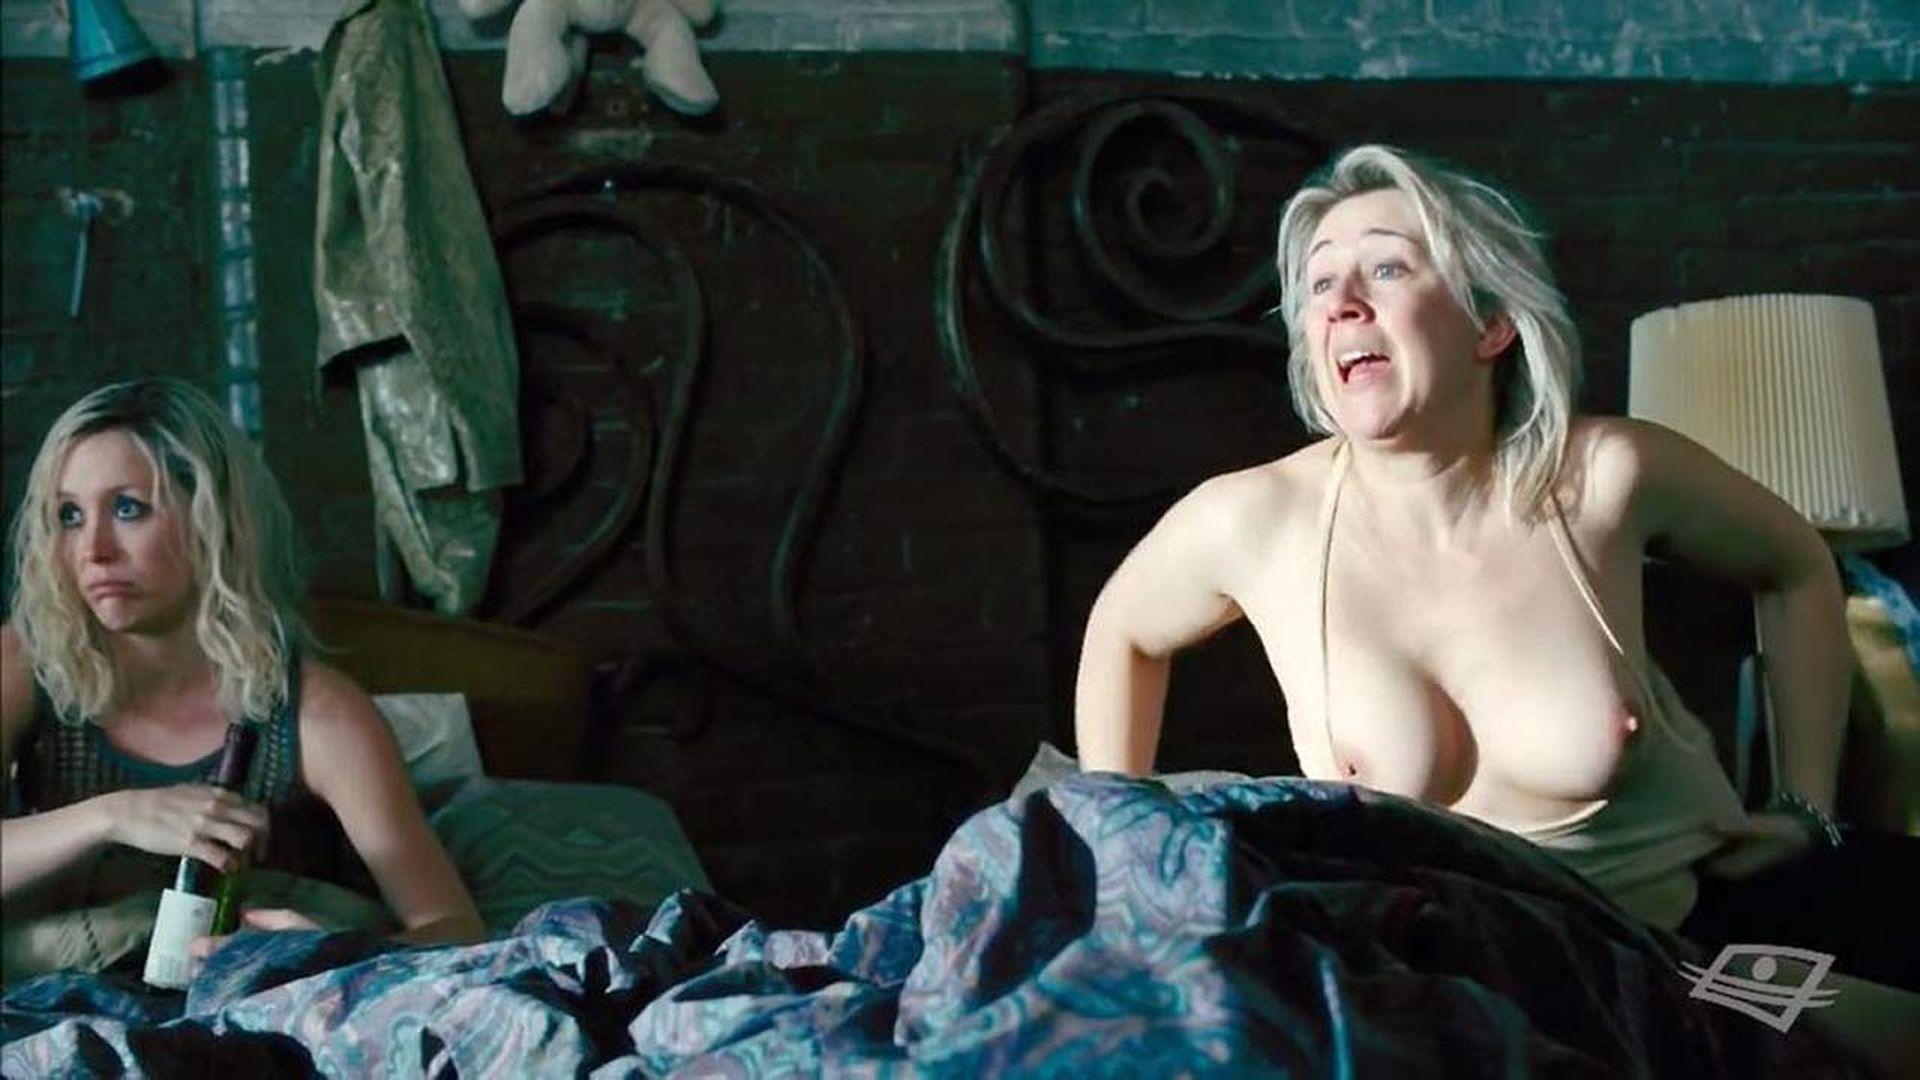 Spanish women images nude